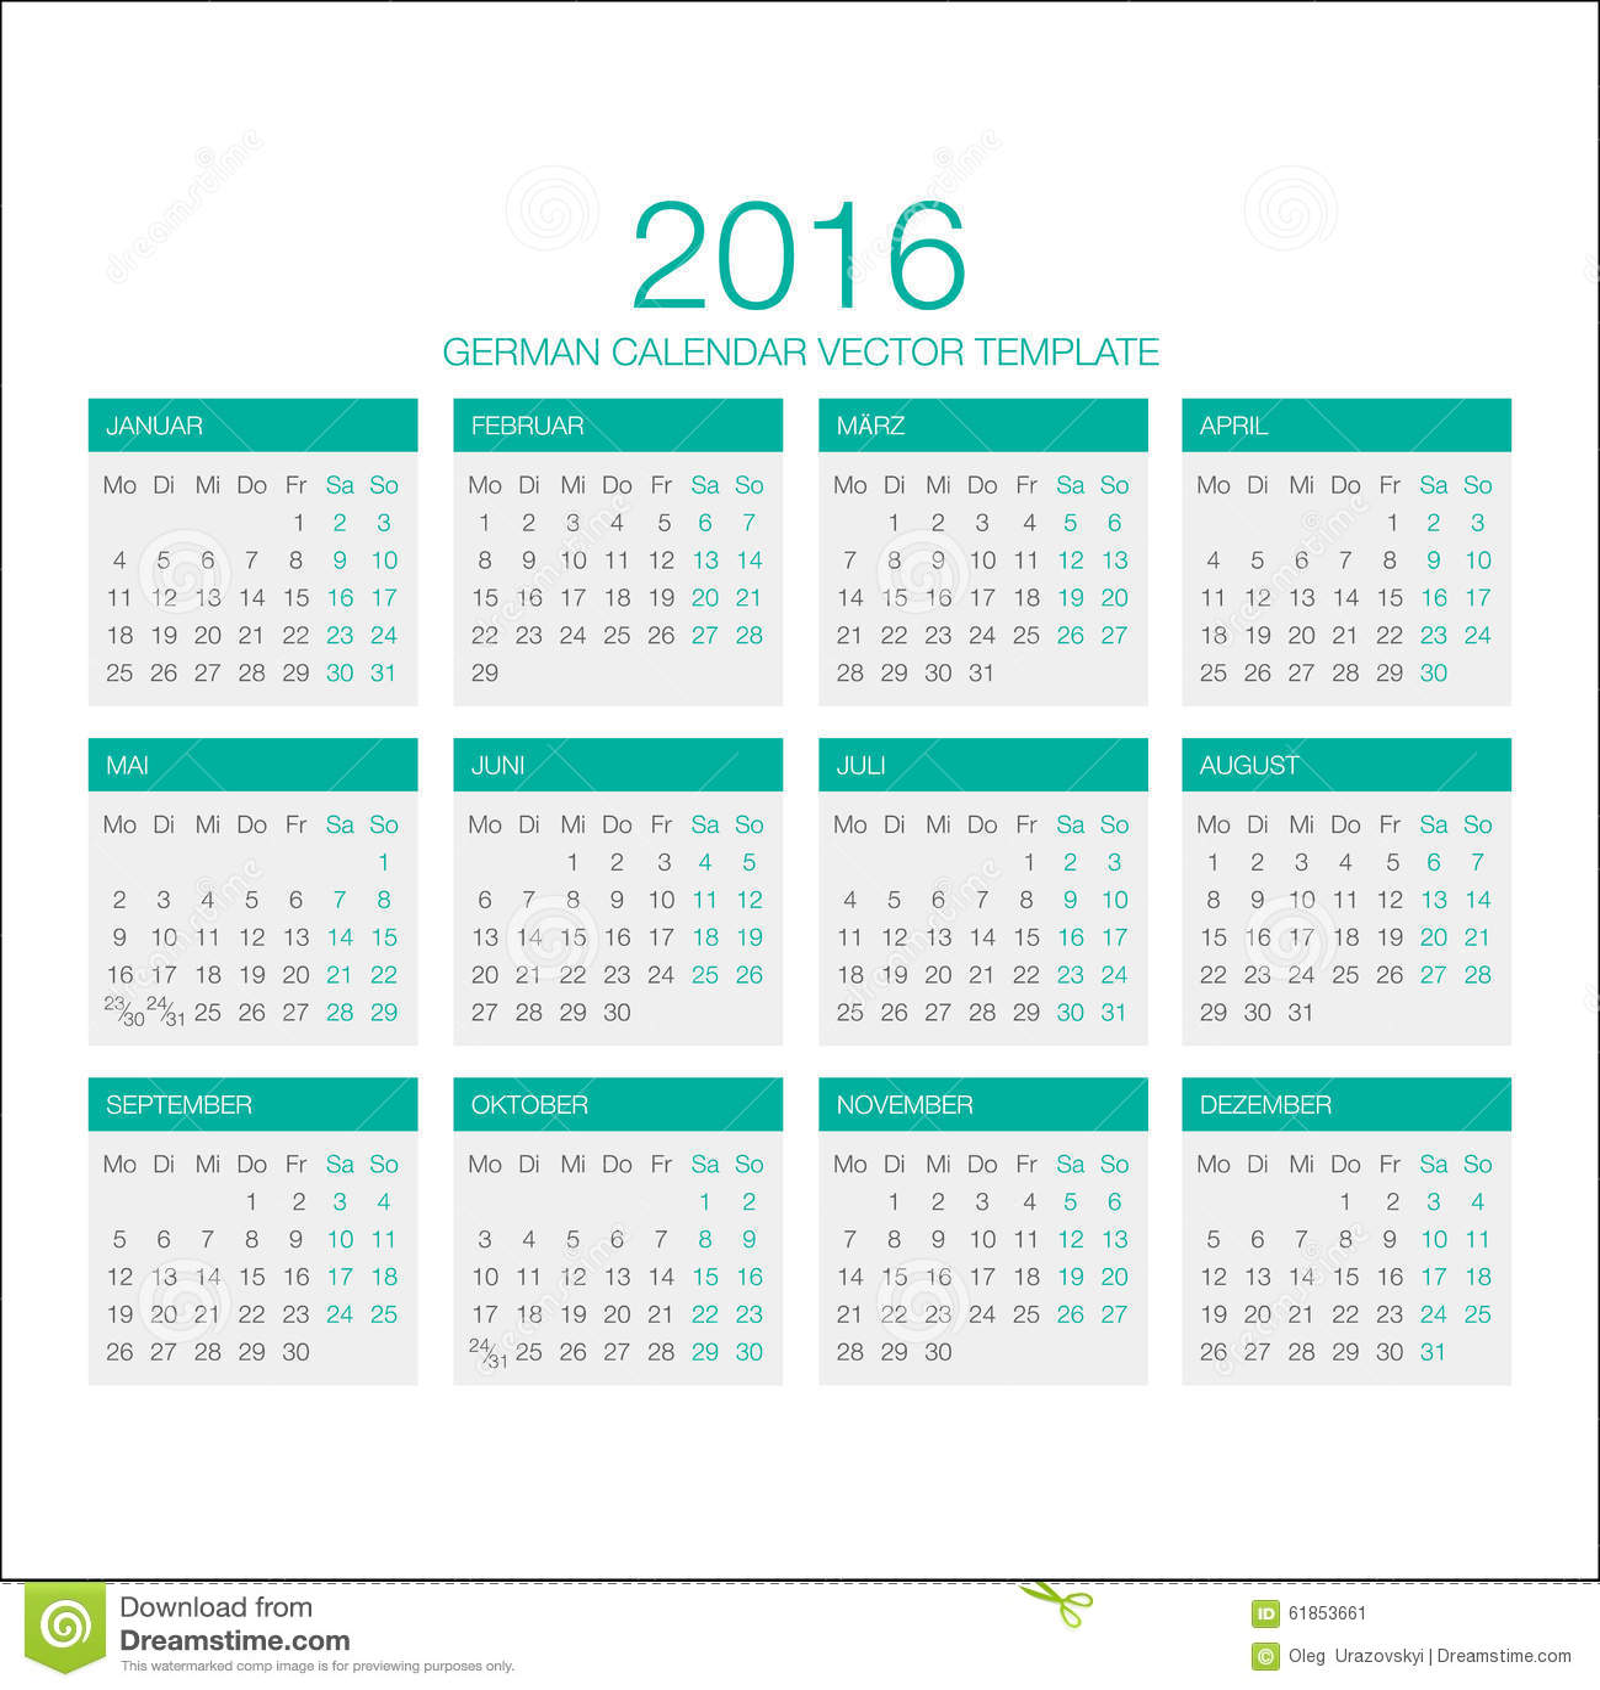 German Calendar Vector 2016 Stock Illustration - Image: 61853661